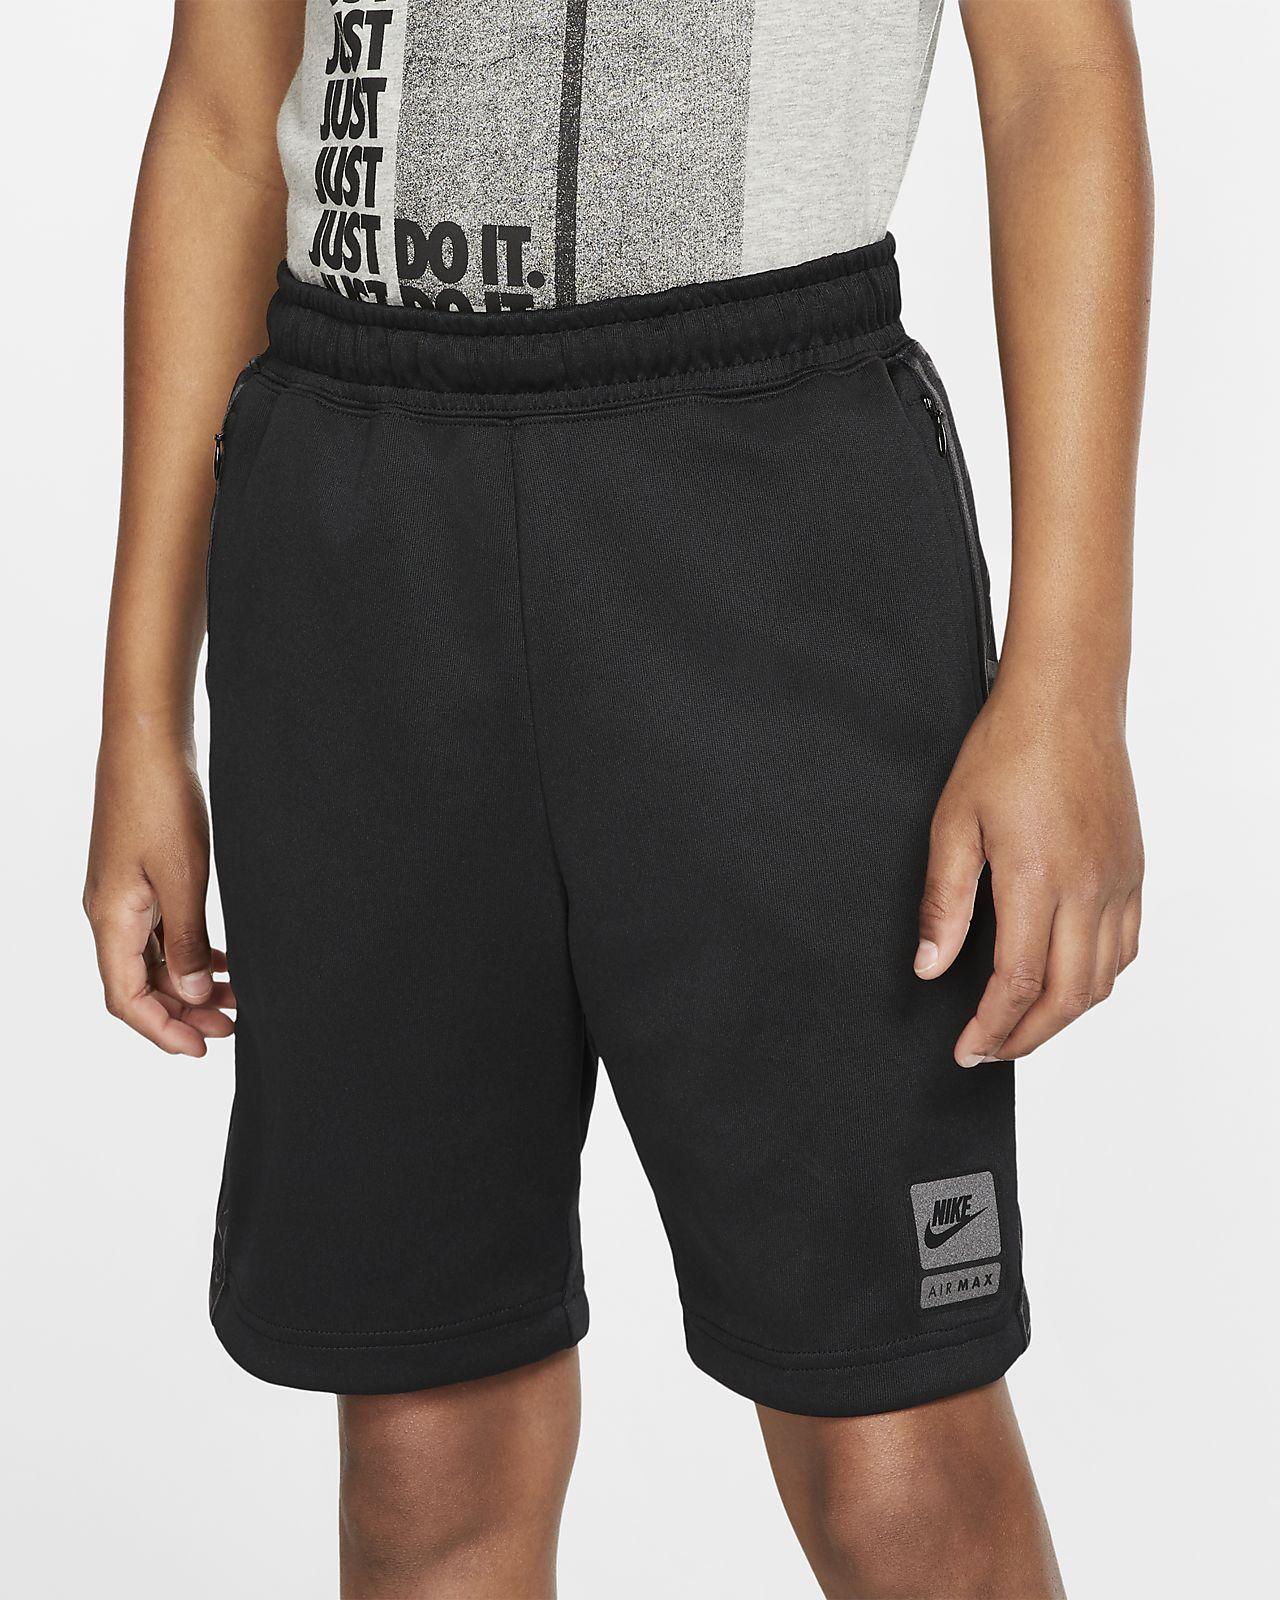 21d60f4644 Nike Sportswear Air Max Older Kids' (Boys') Shorts